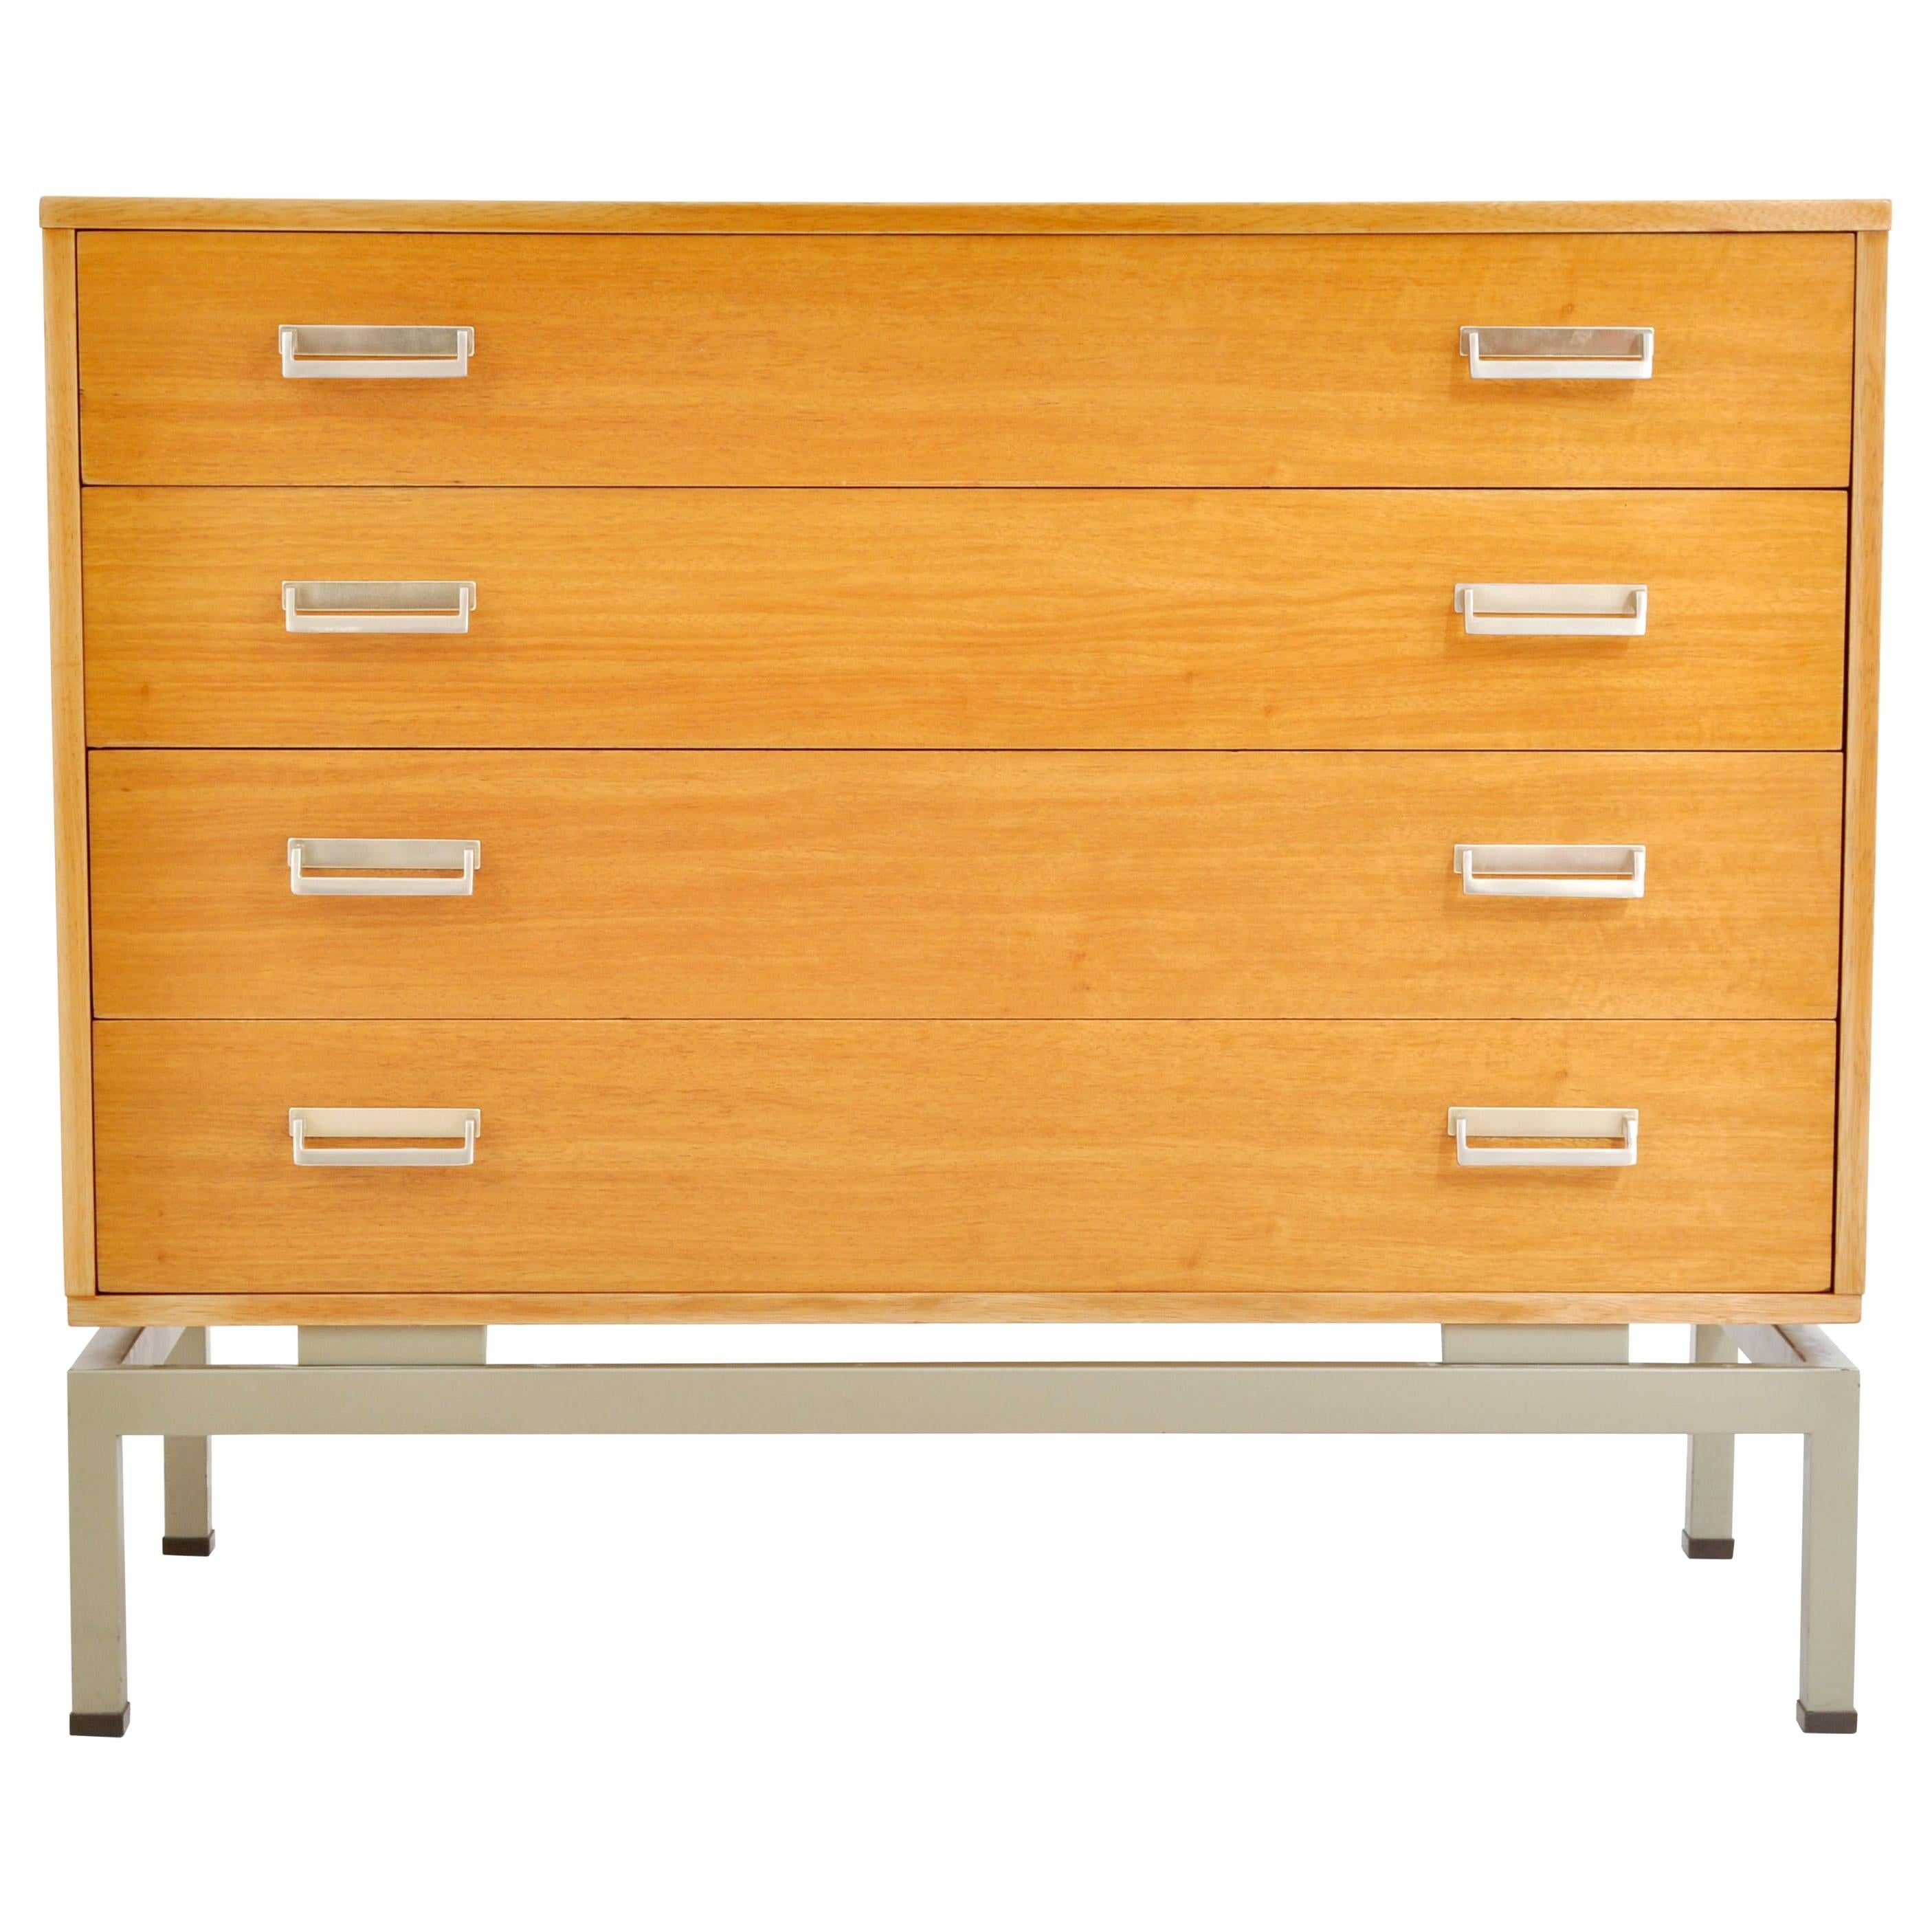 "Mid-Century Modern Danish Style Teak ""Limba"" Chest of Drawers by G Plan, 1950s"